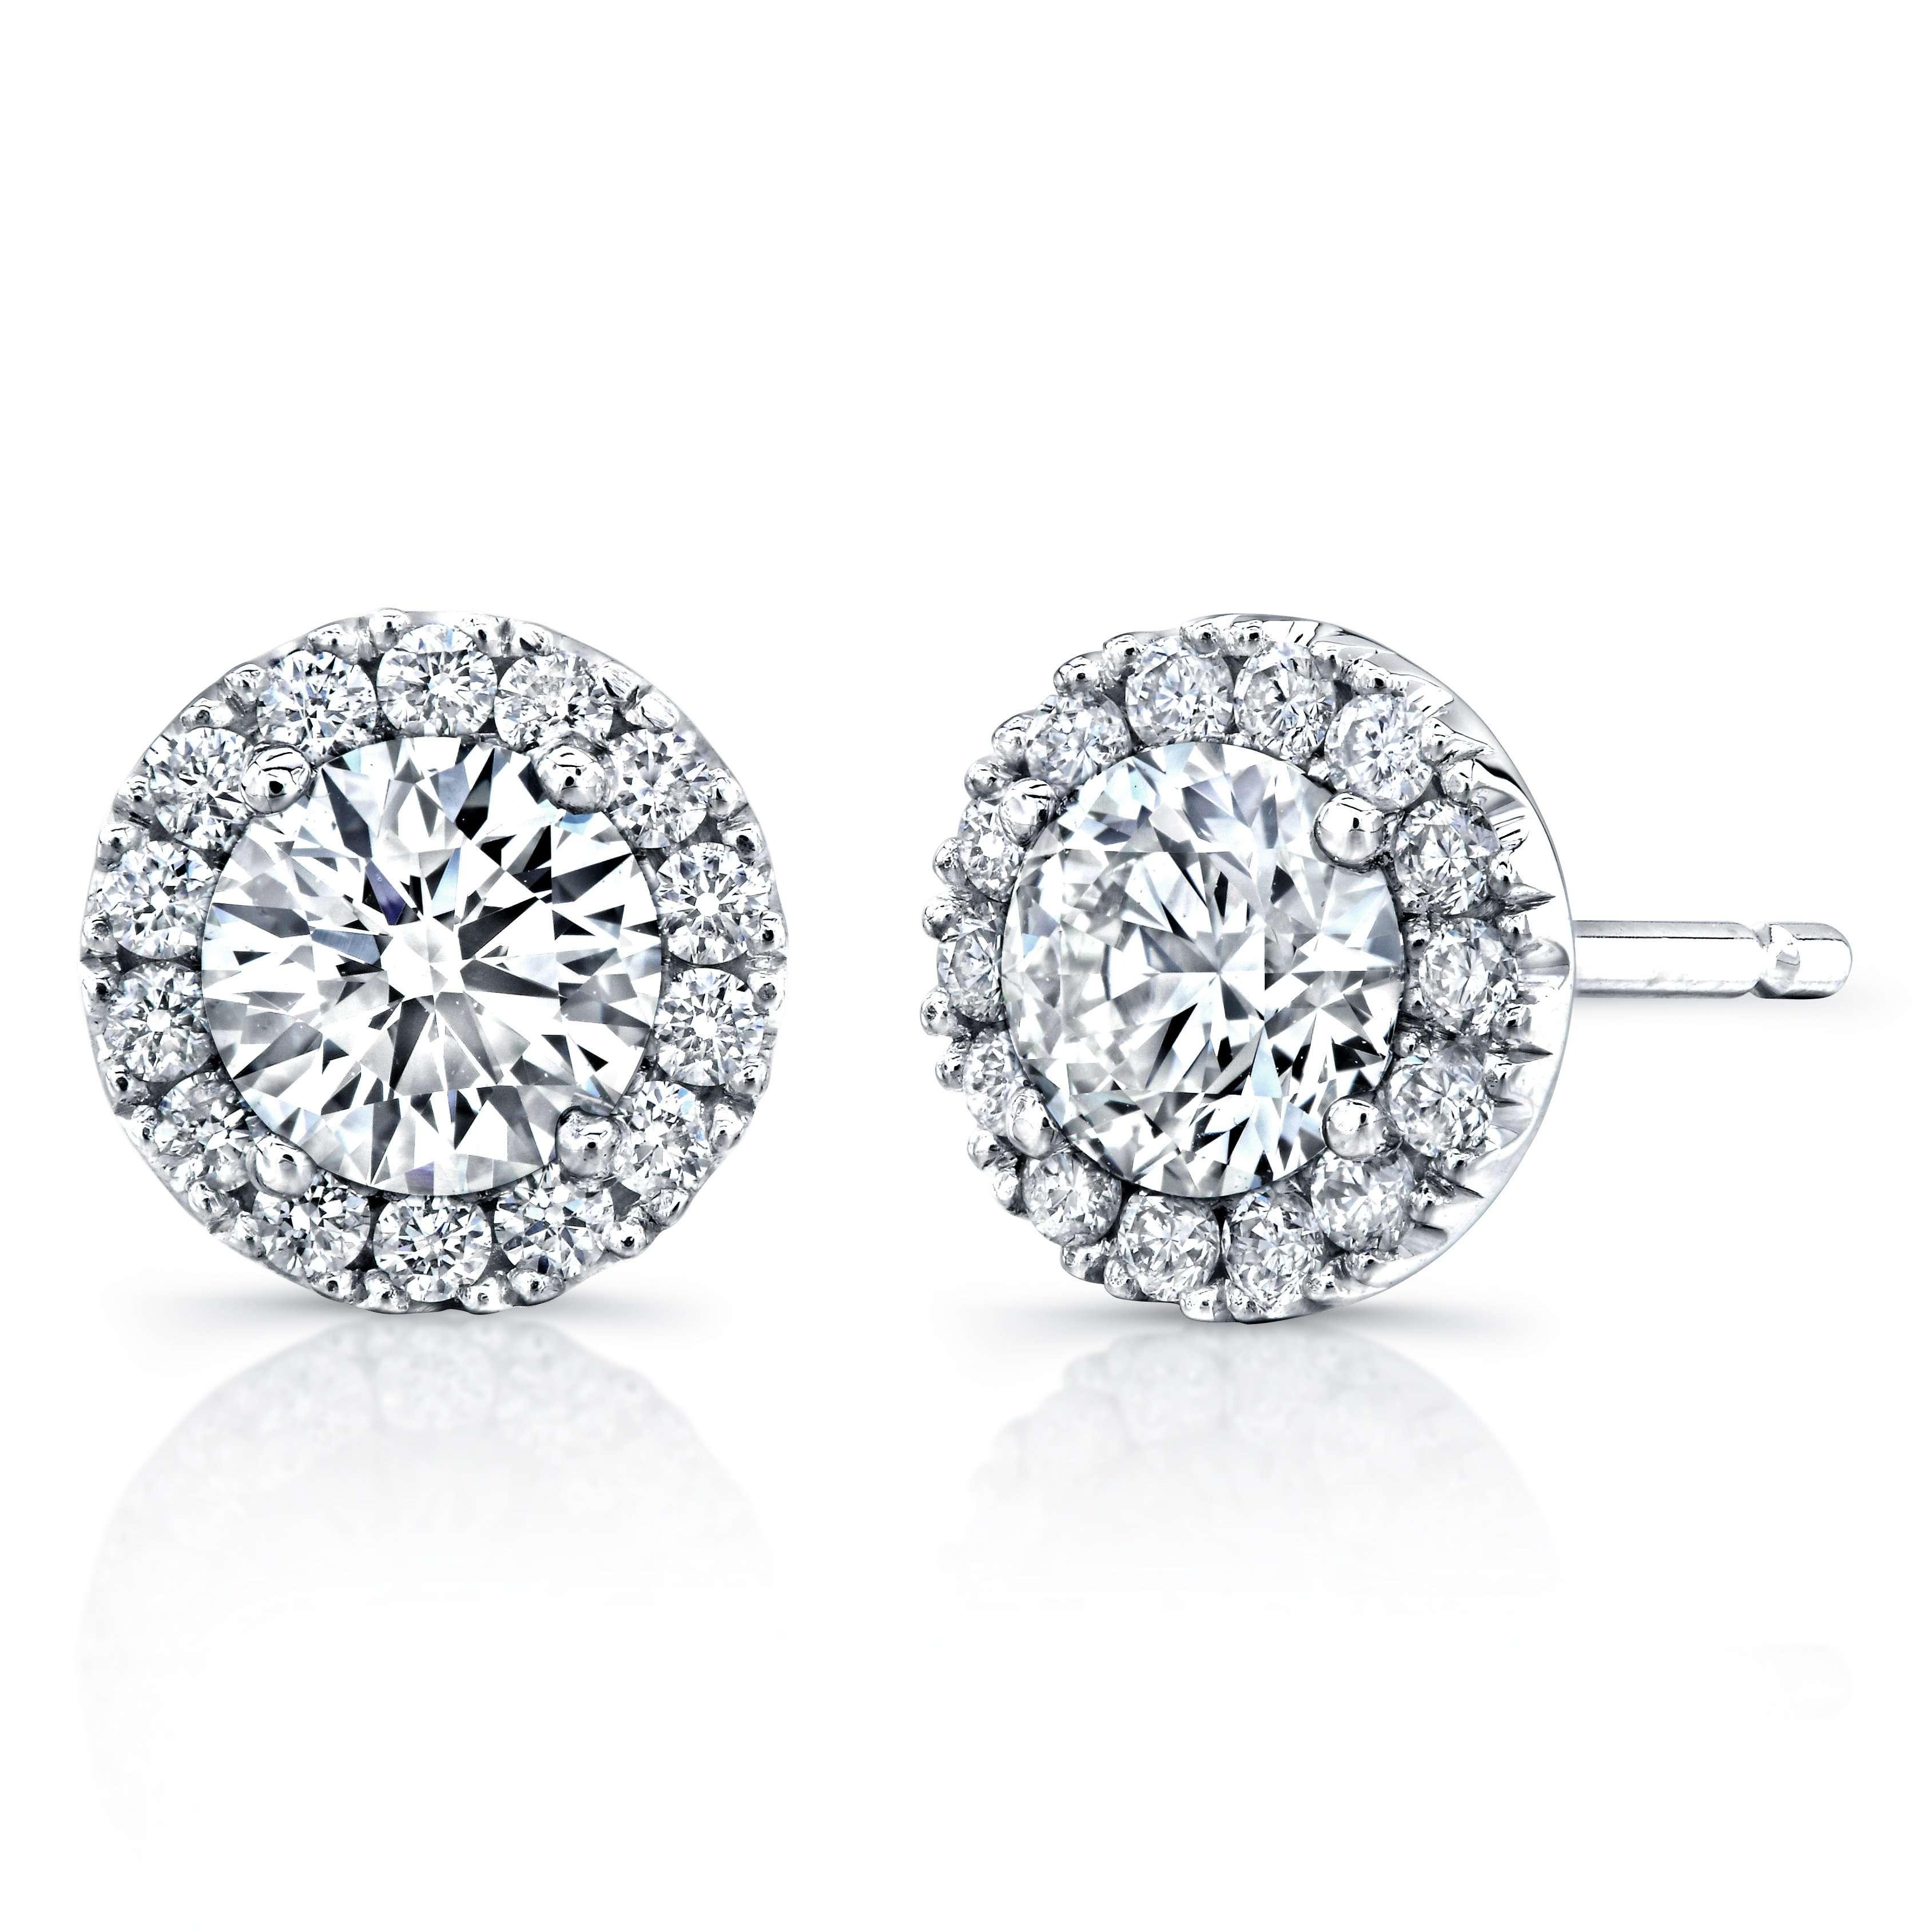 Deutsch Signature Round Cut Diamond With Halo Stud Earrings